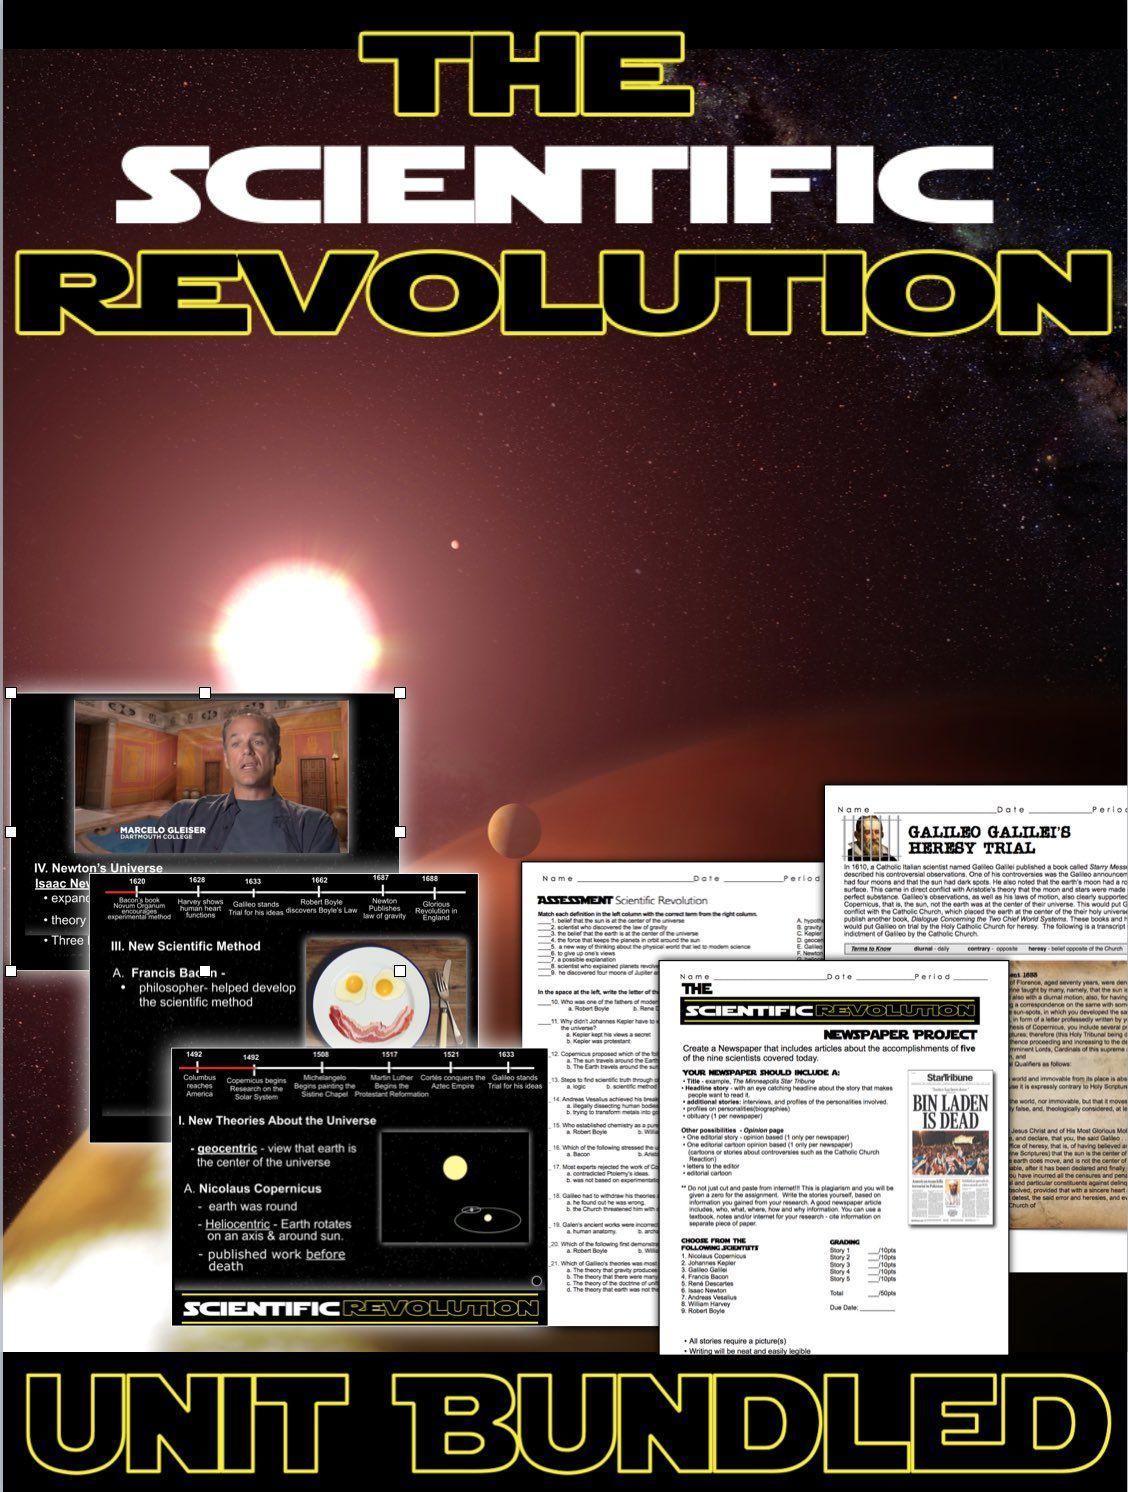 worksheet The Scientific Revolution Worksheet scientific revolution unit ppts worksheets project lesson plans planstest